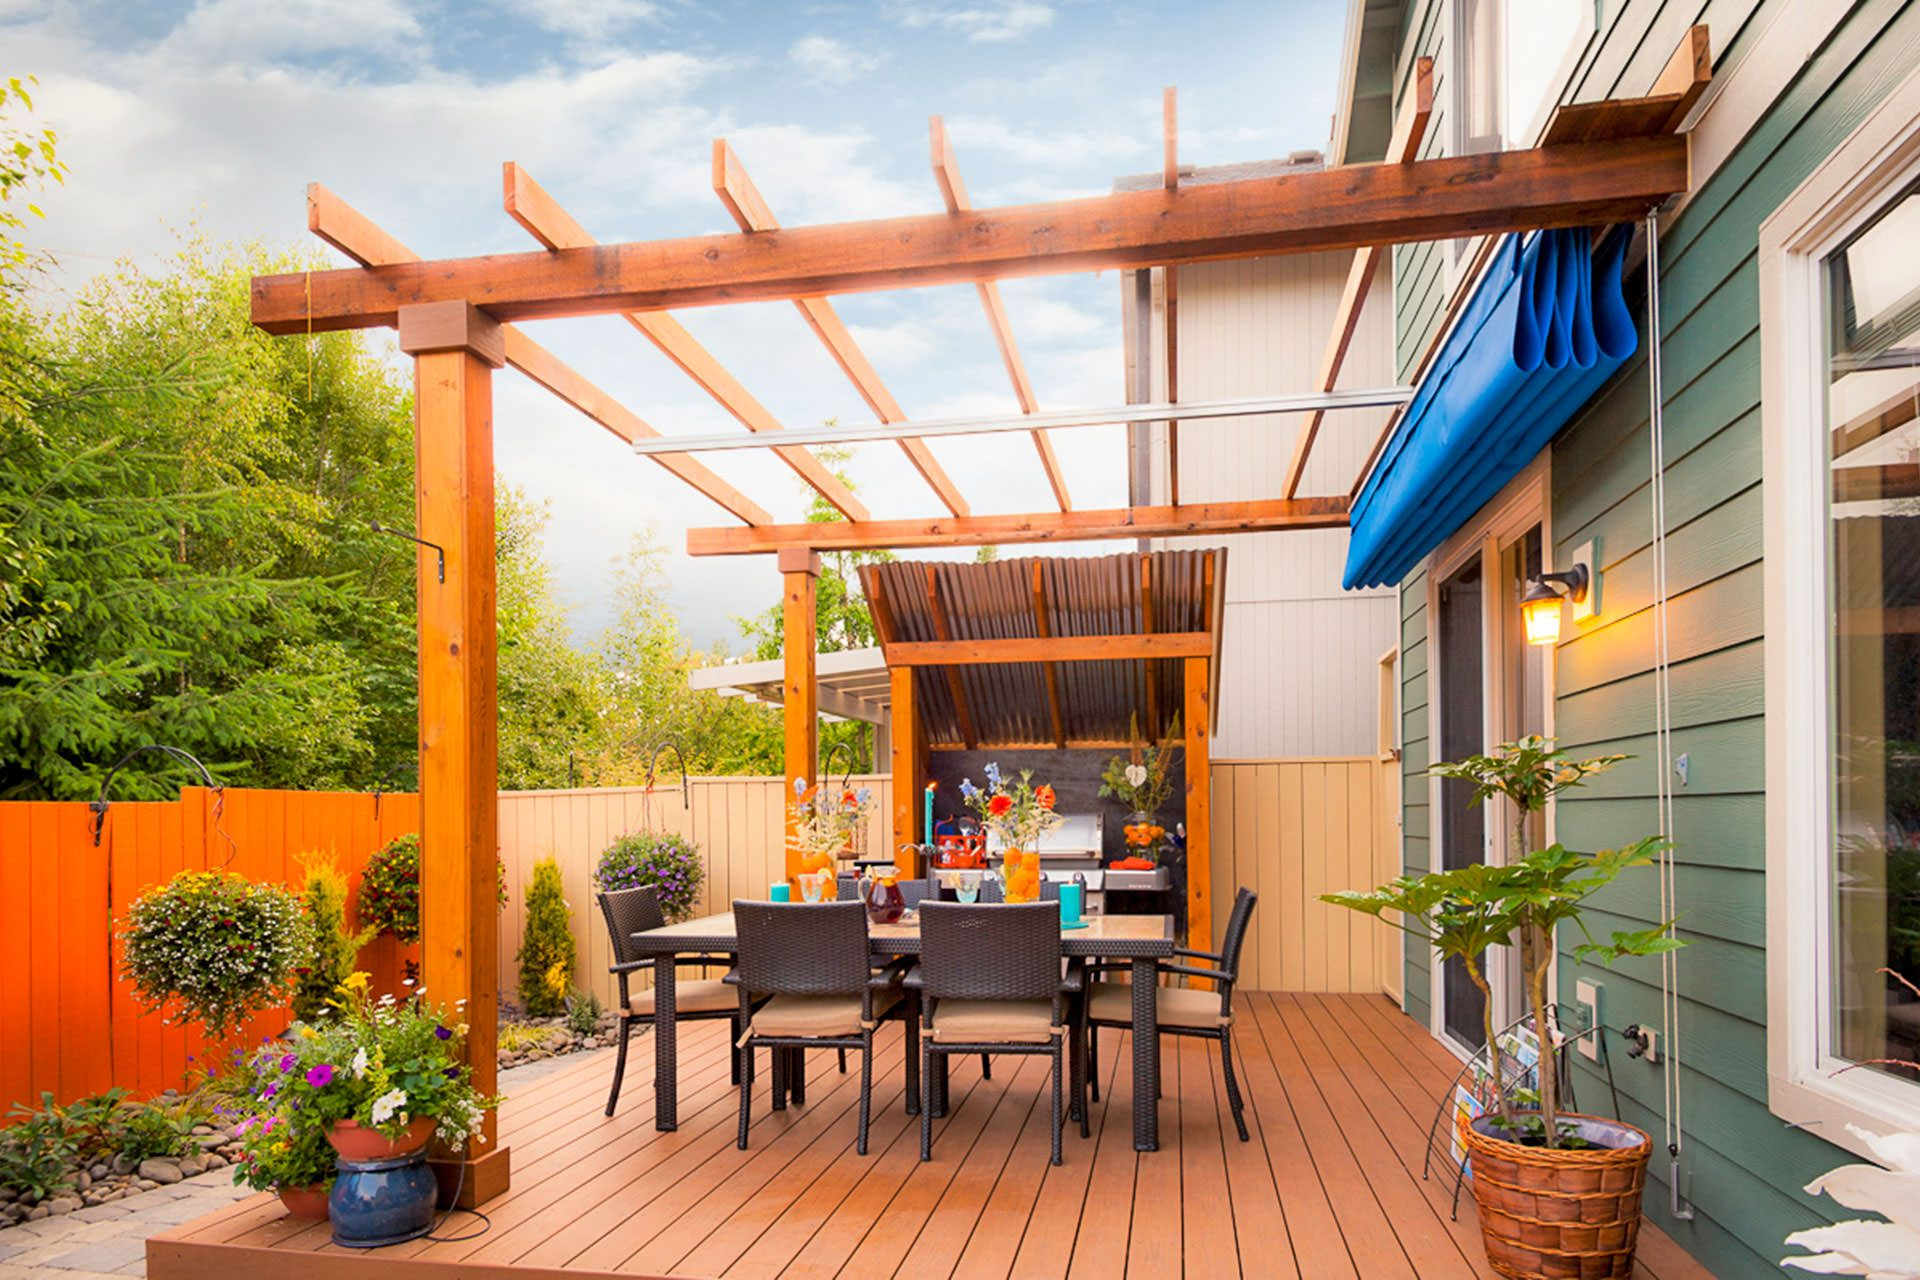 Retractable Patio Cover in Vancouver | Pergola patio